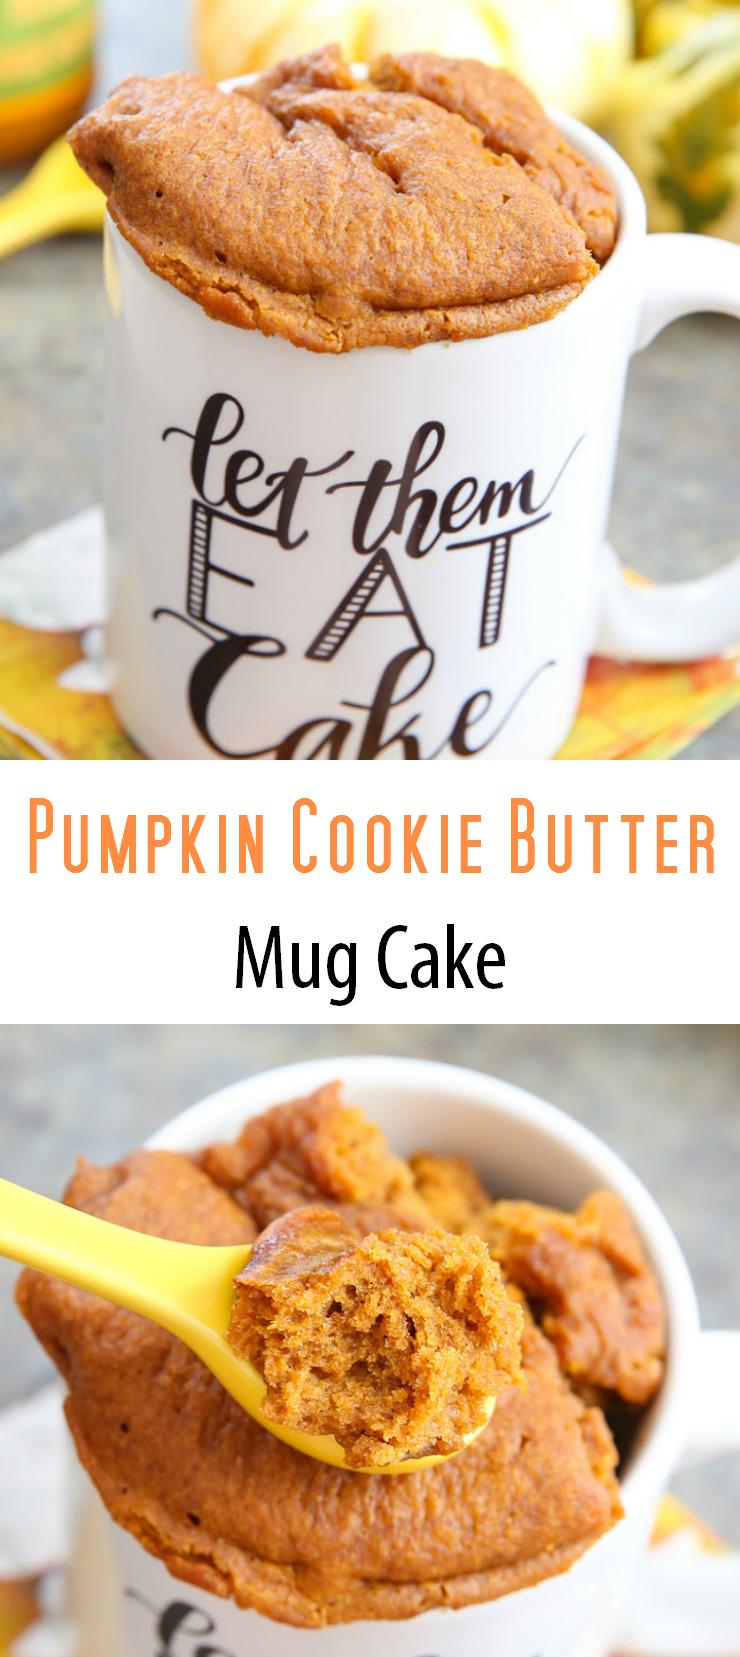 photo collage of Pumpkin Cookie Butter Mug Cake